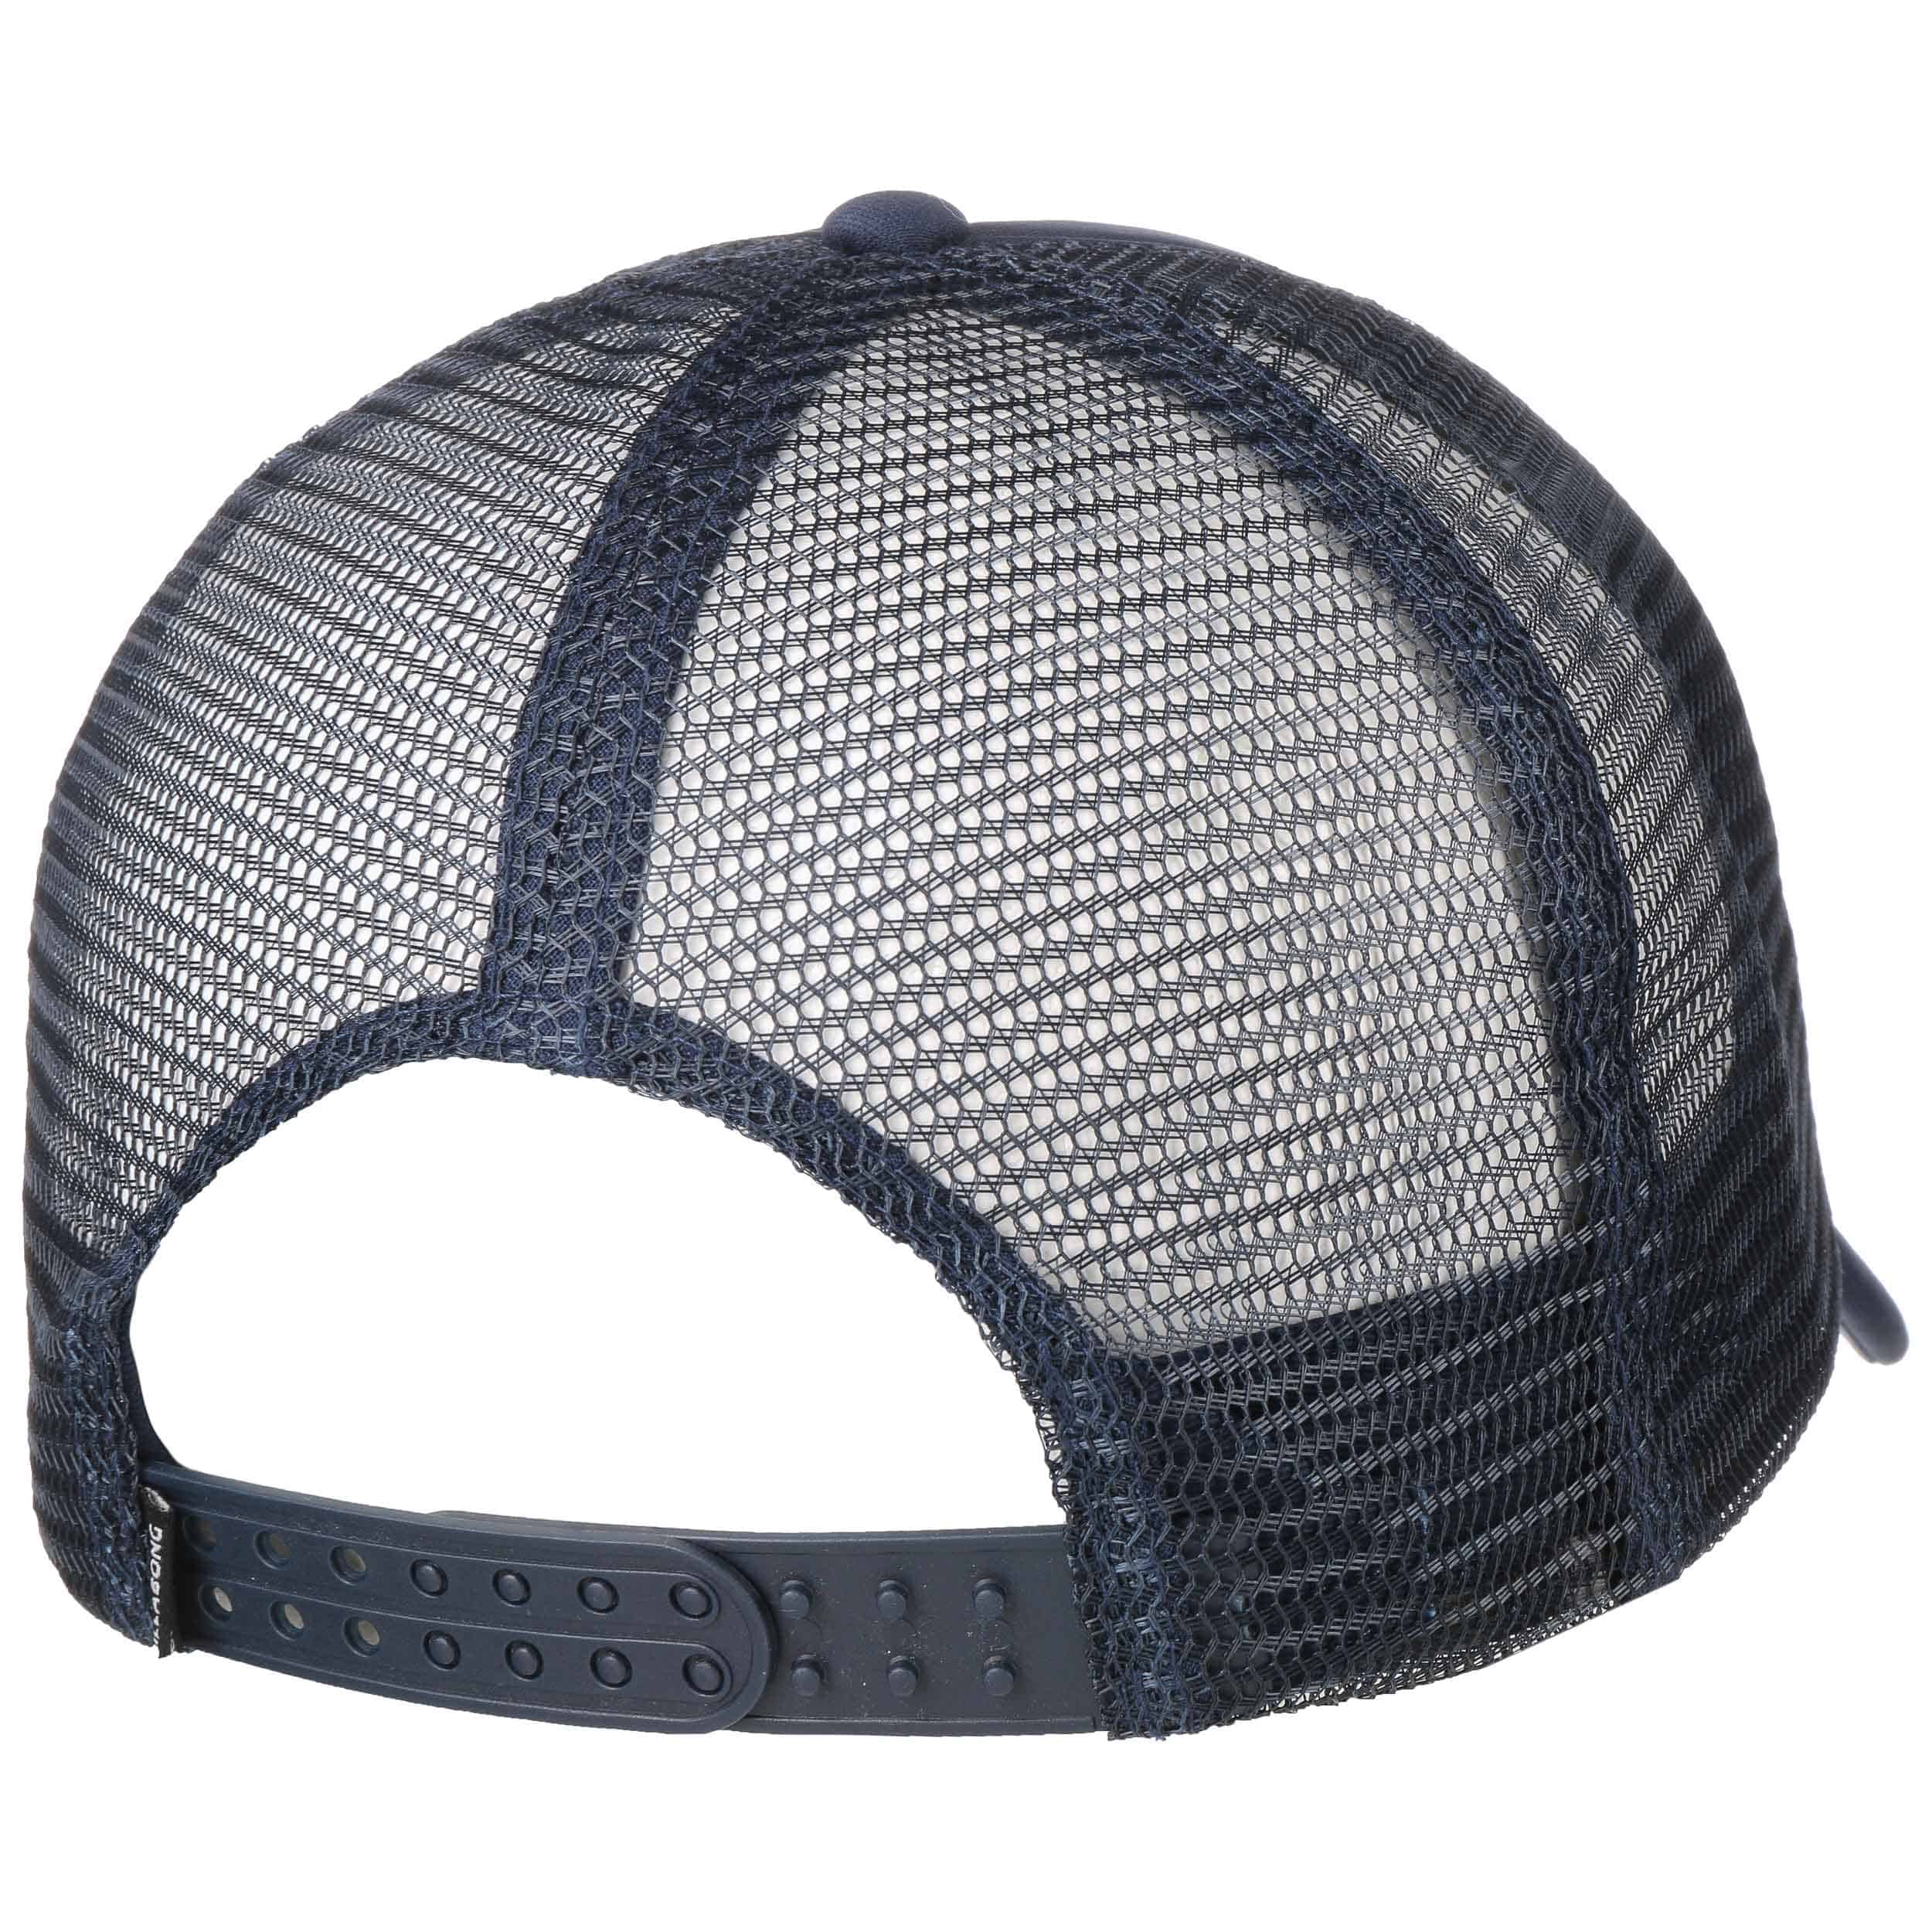 Gorra Podium Trucker by Billabong - Gorras - sombreroshop.es 1445f264831